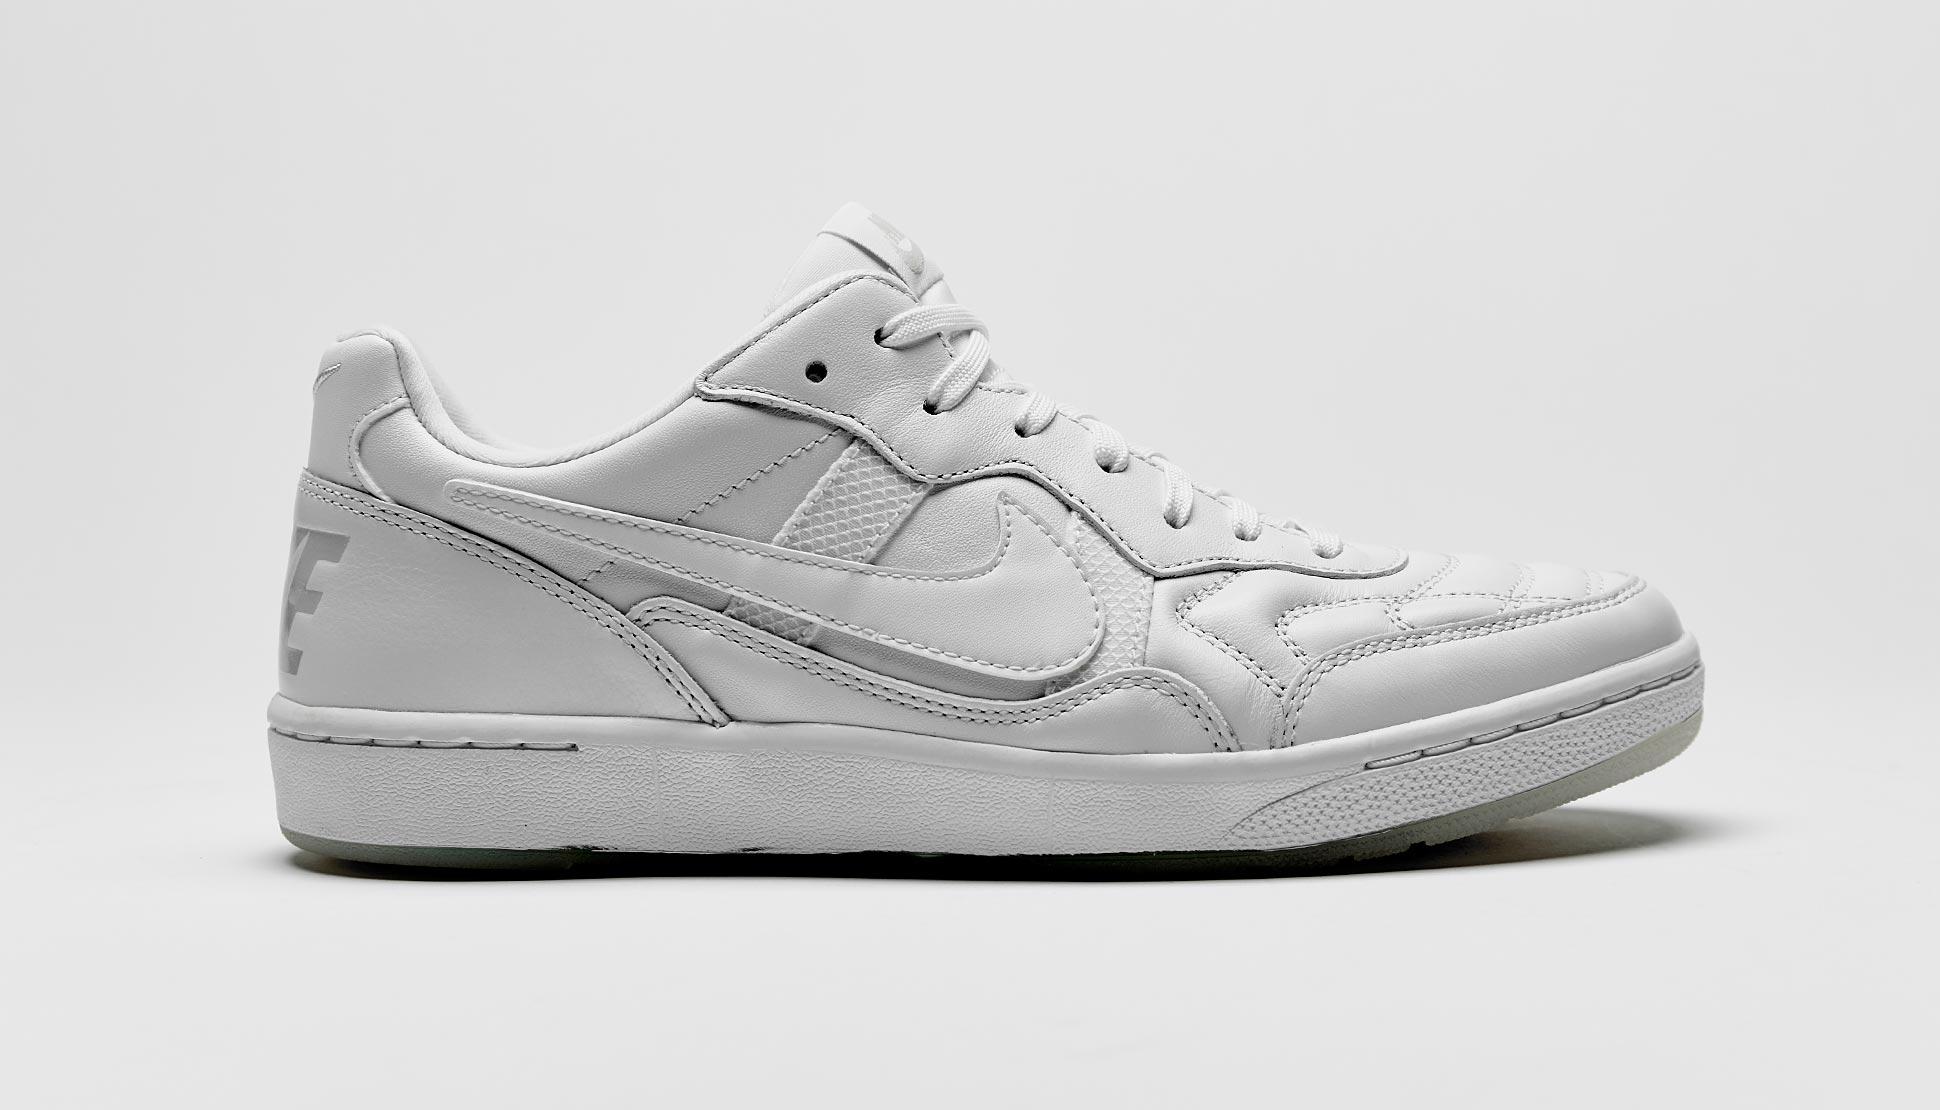 Nike SS15 Tiempo 94 Updates